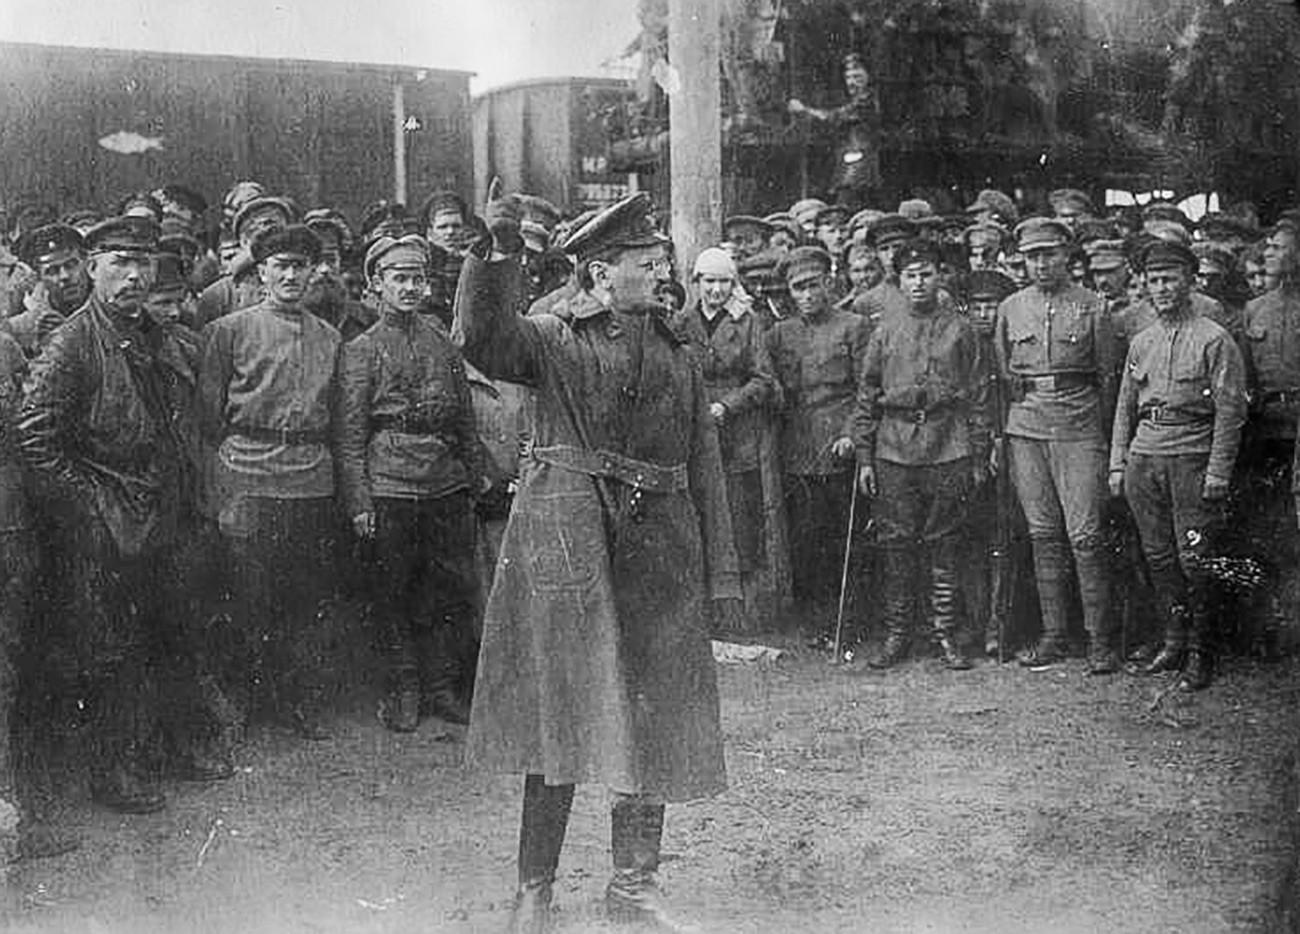 Lav Trocki drži govor vojnicima.